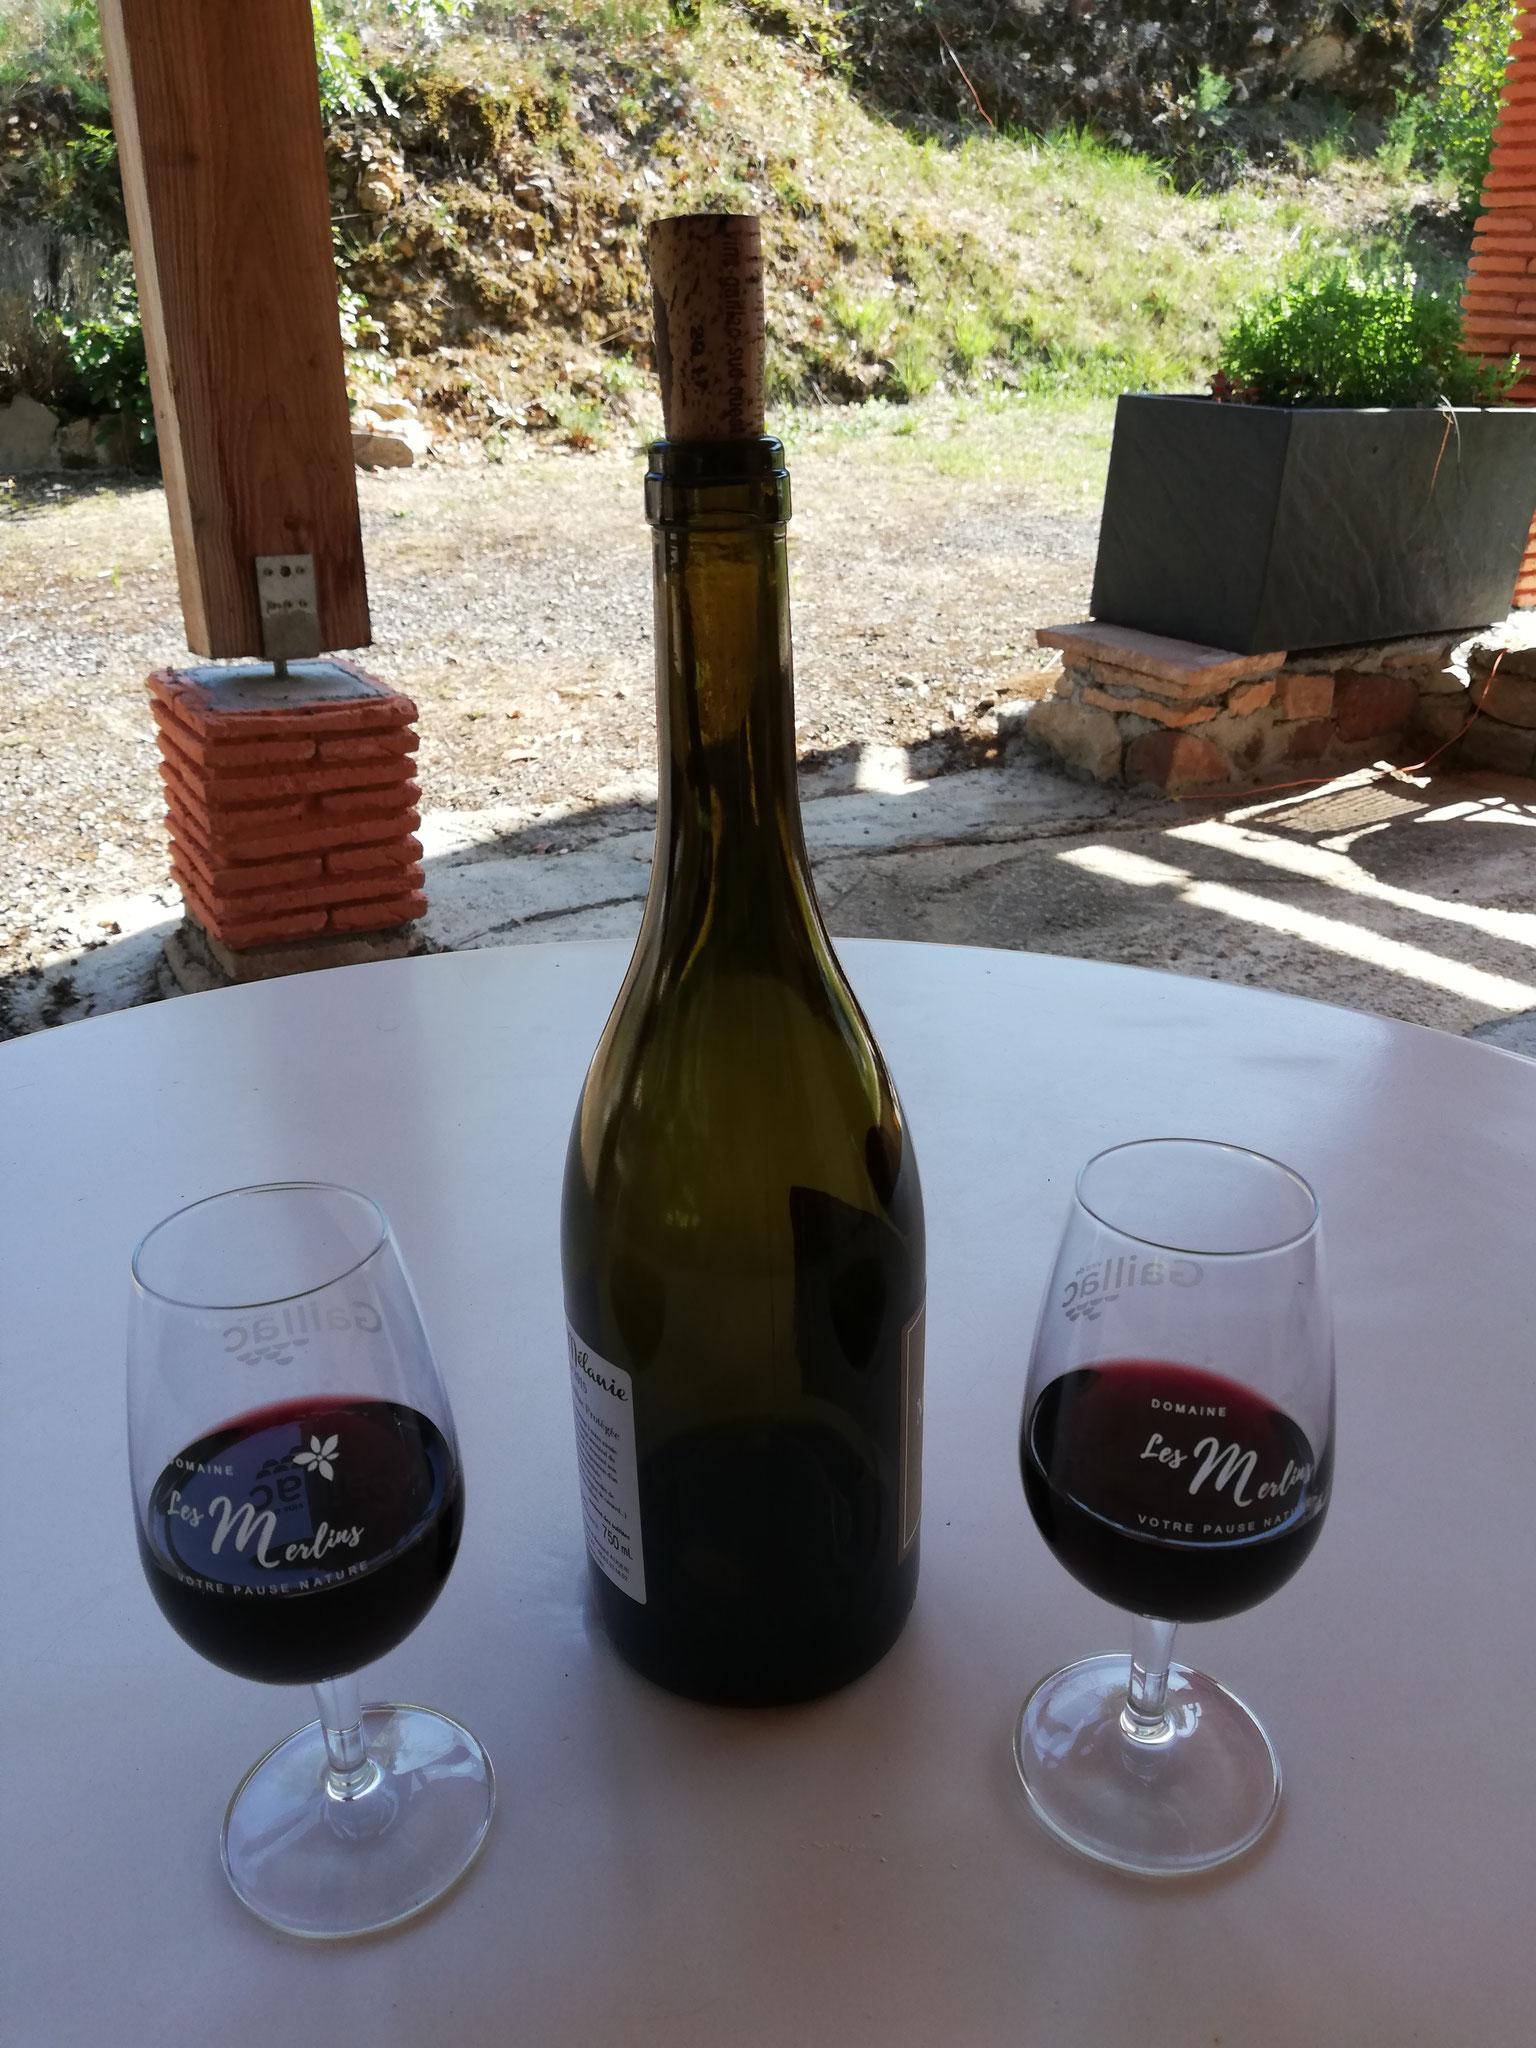 Goûter les vins de Gaillac